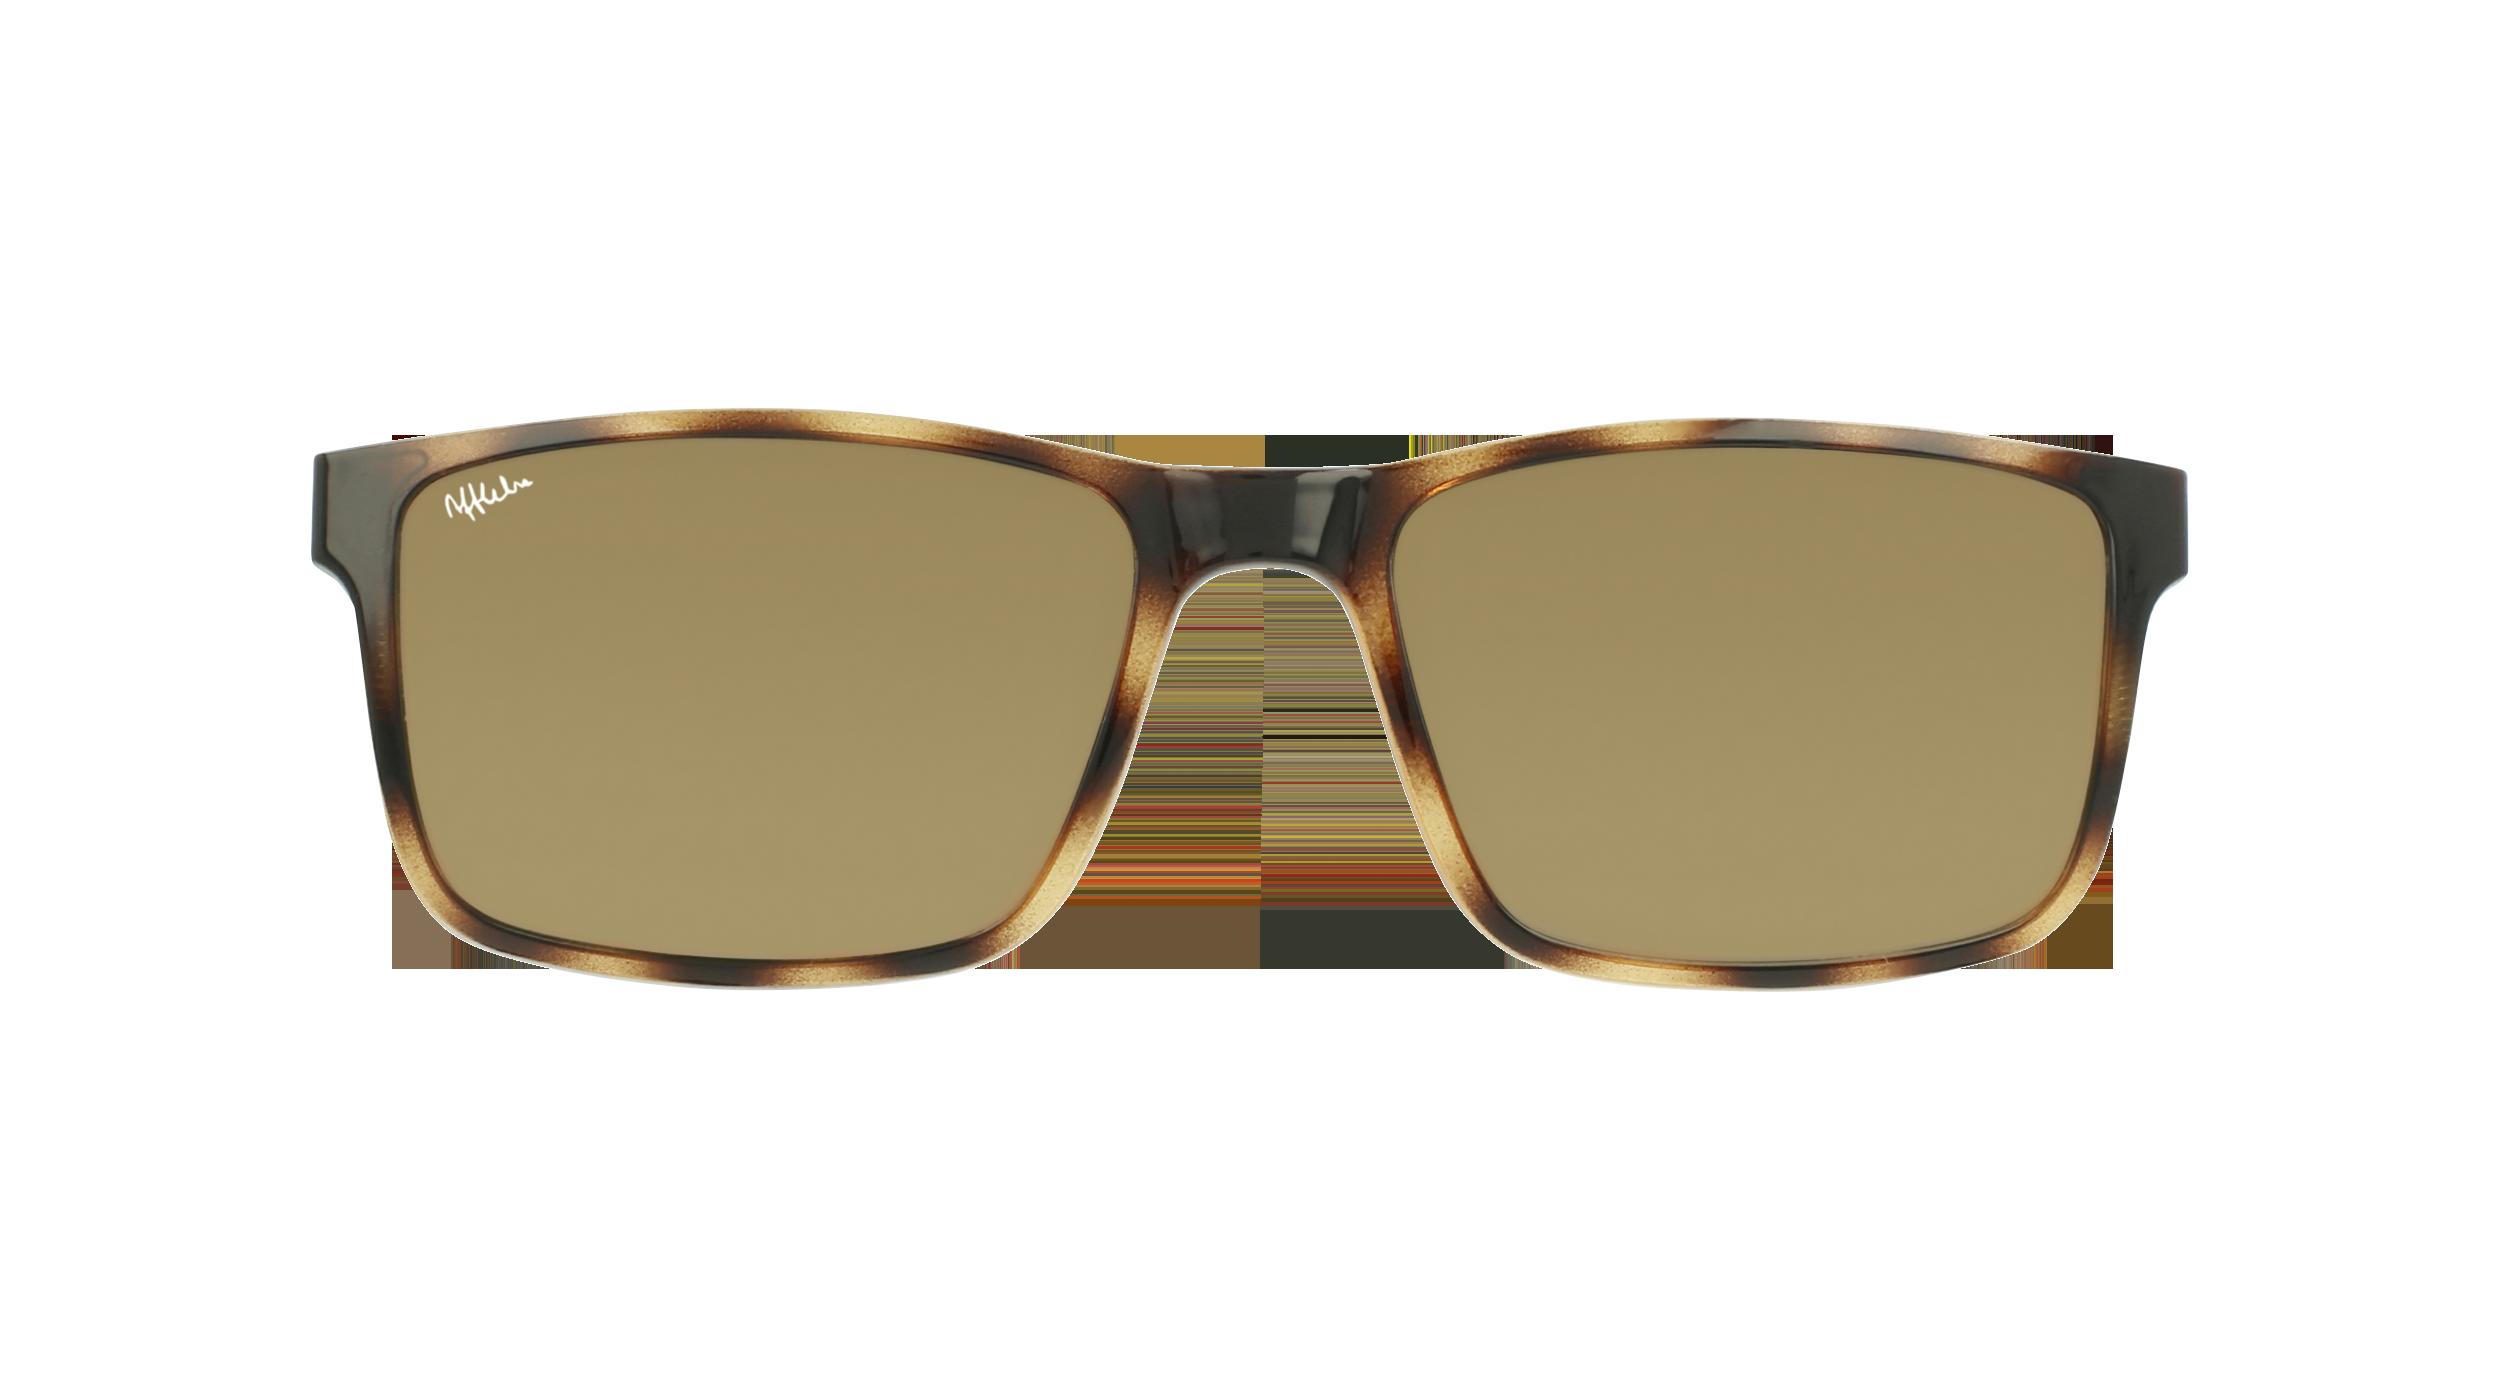 afflelou/france/products/smart_clip/clips_glasses/07630036457450.png